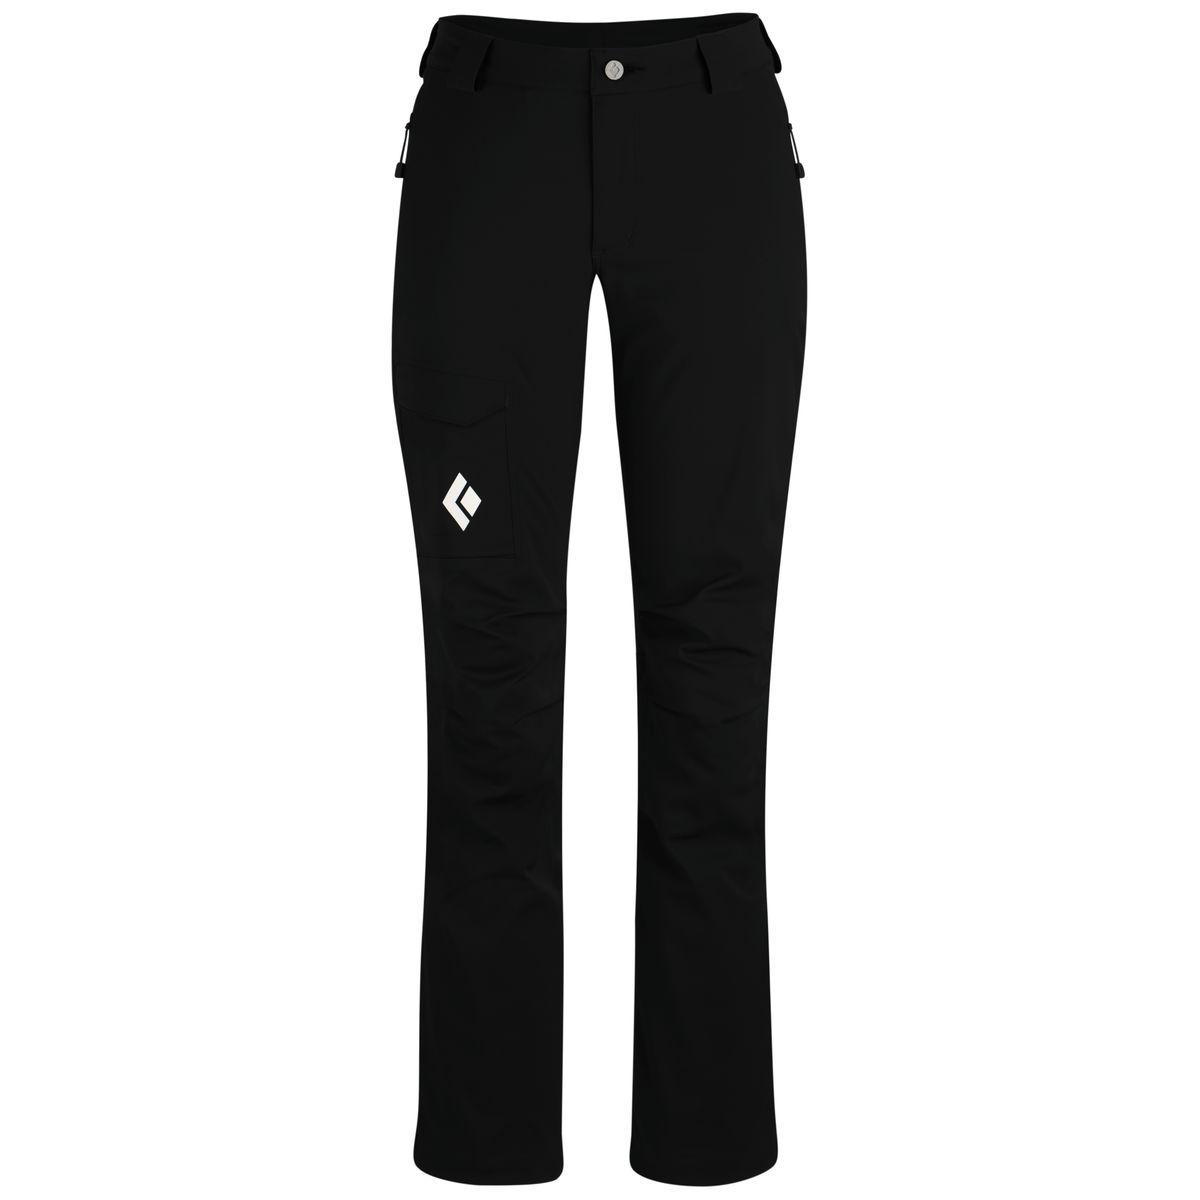 Black Diamond Dawn Patrol LT Pants